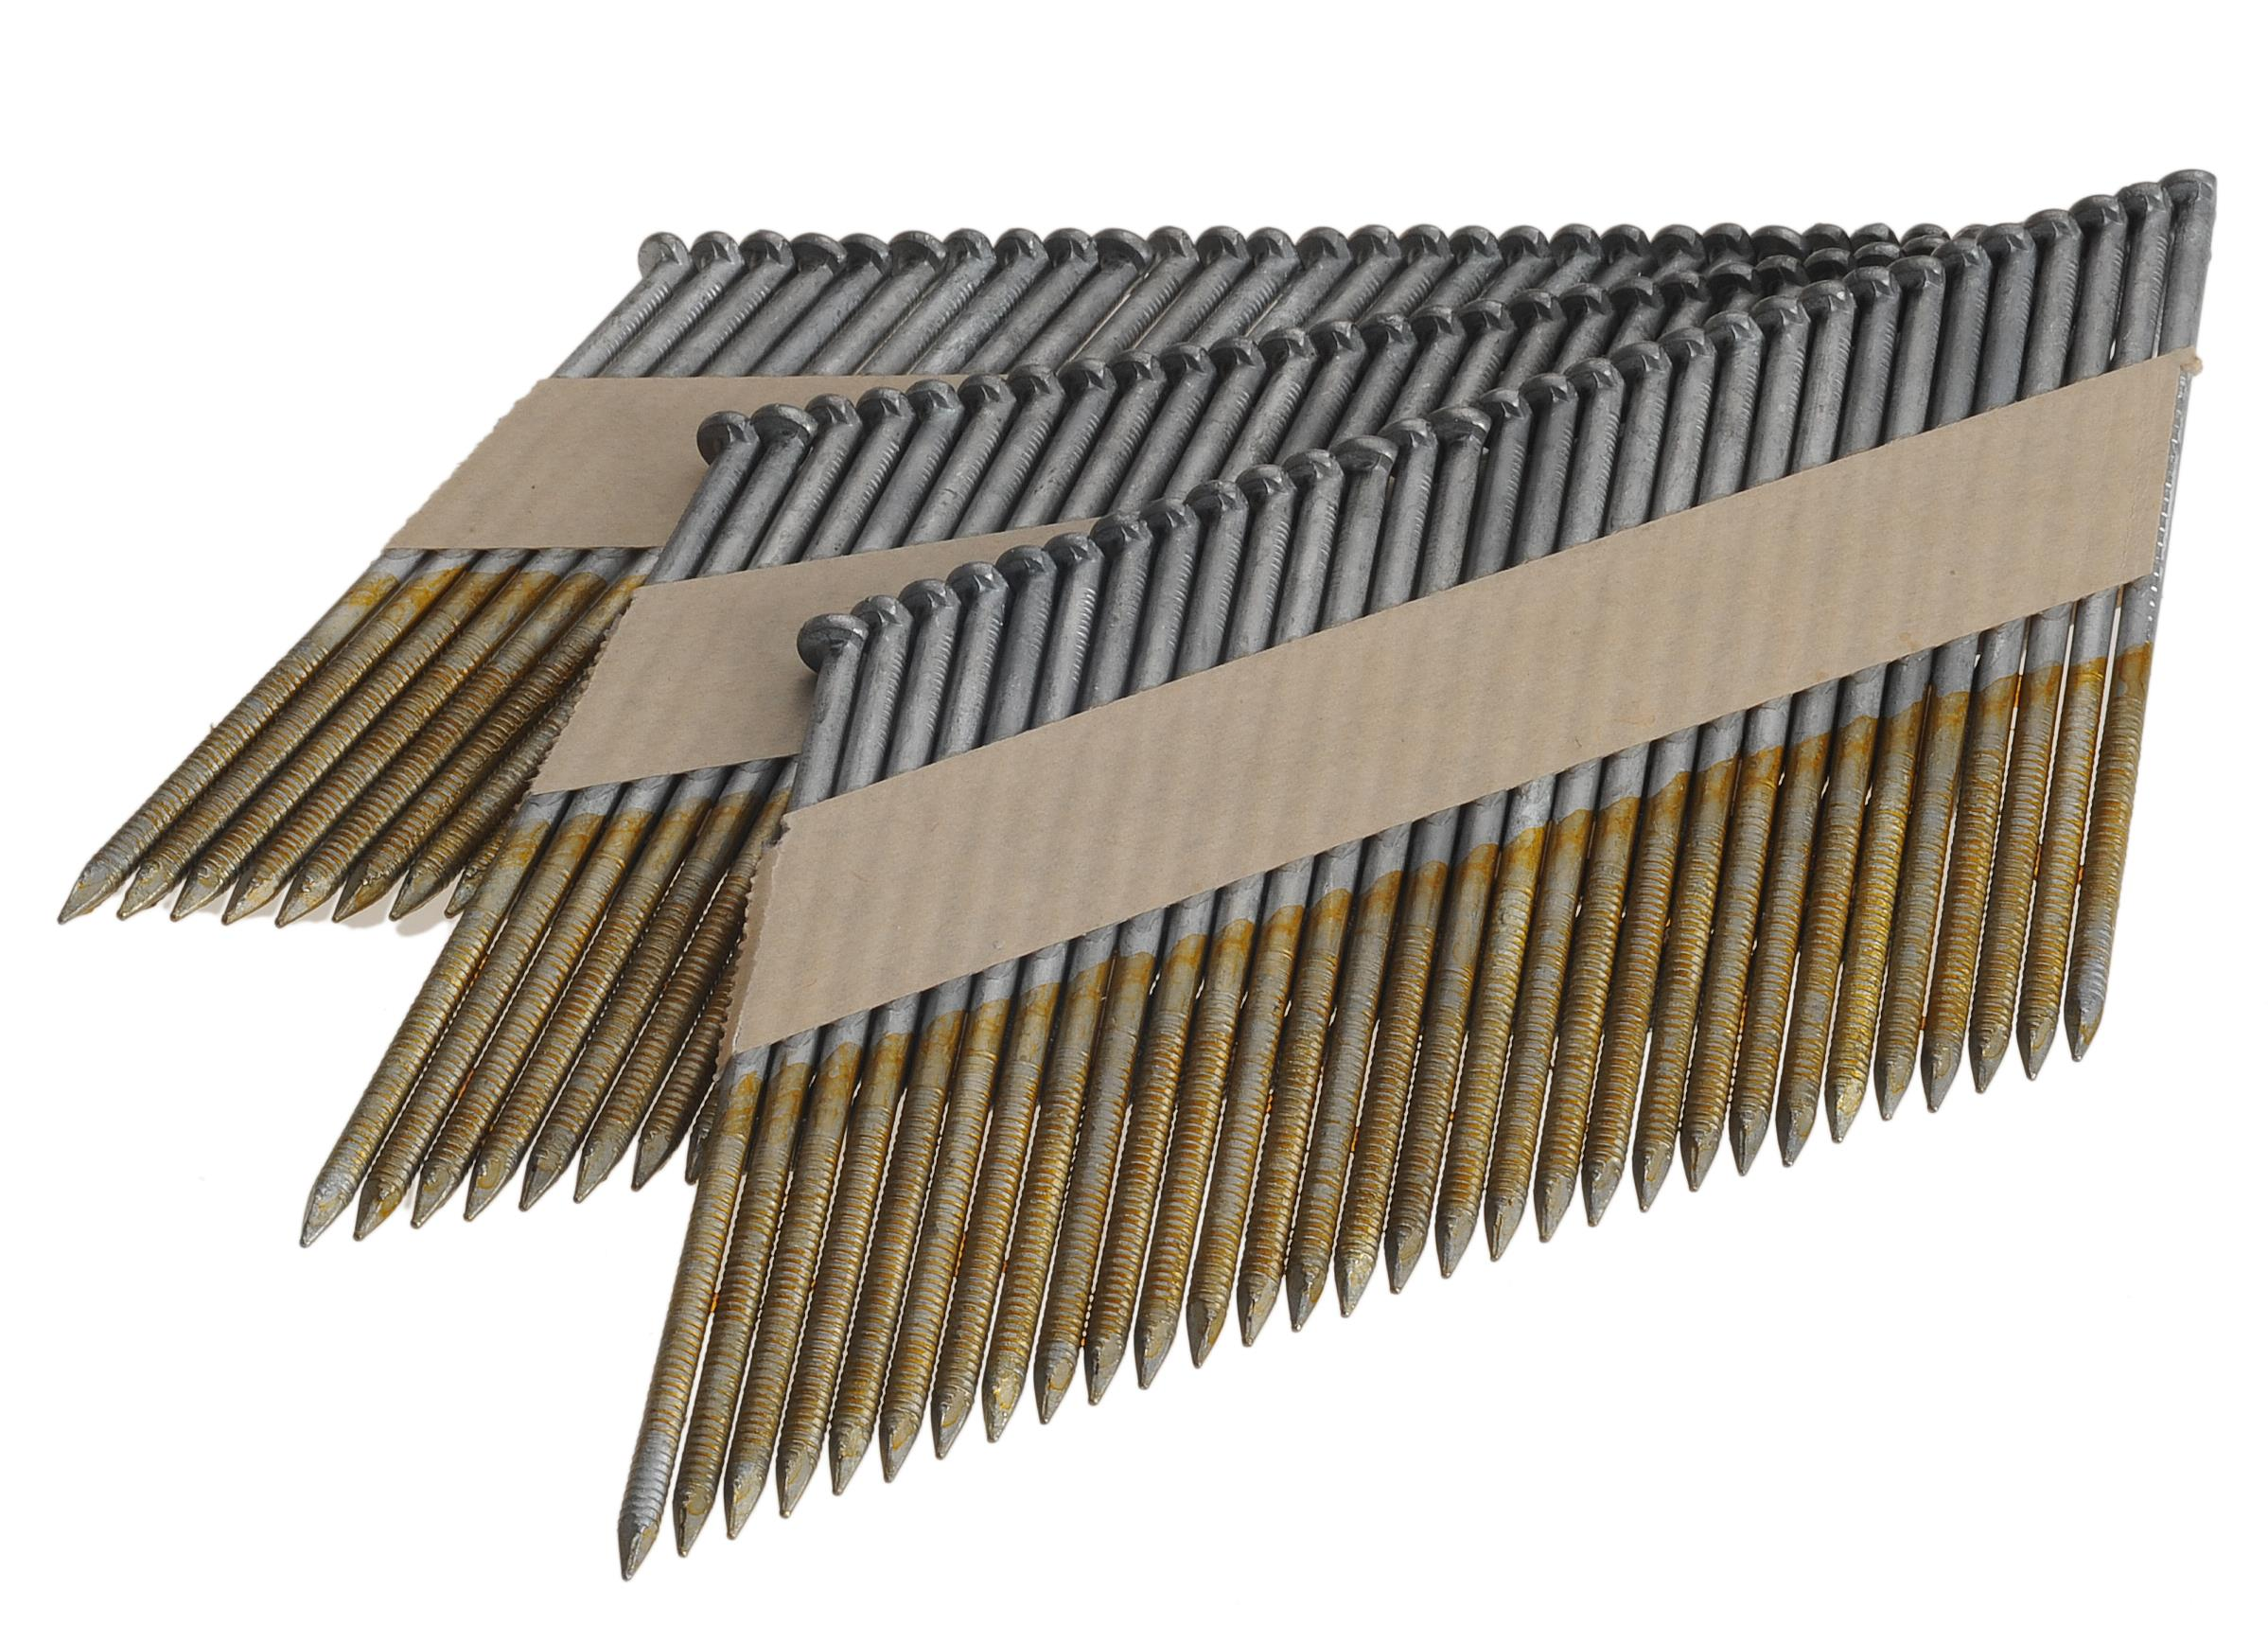 Aerfast AN40034 Objektspik VFZ 28 x 65 mm tätband. 34° 2500-pack